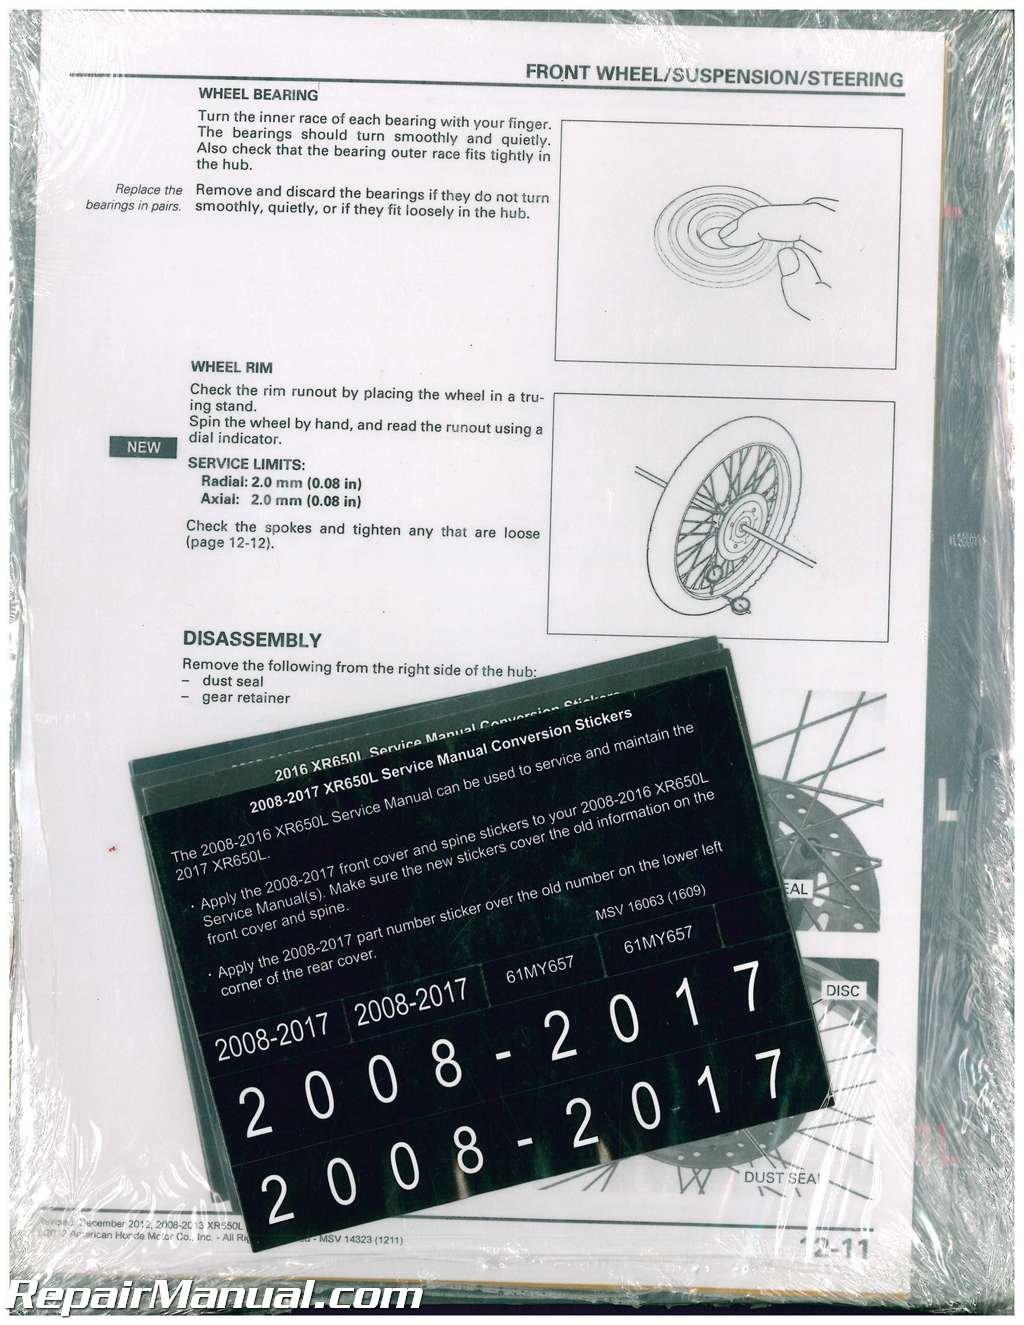 61my657 2008 2017 Honda Xr650l Dual Sport Motorcycle Service Manual Wiring Diagram 2004 Manufacturer Books